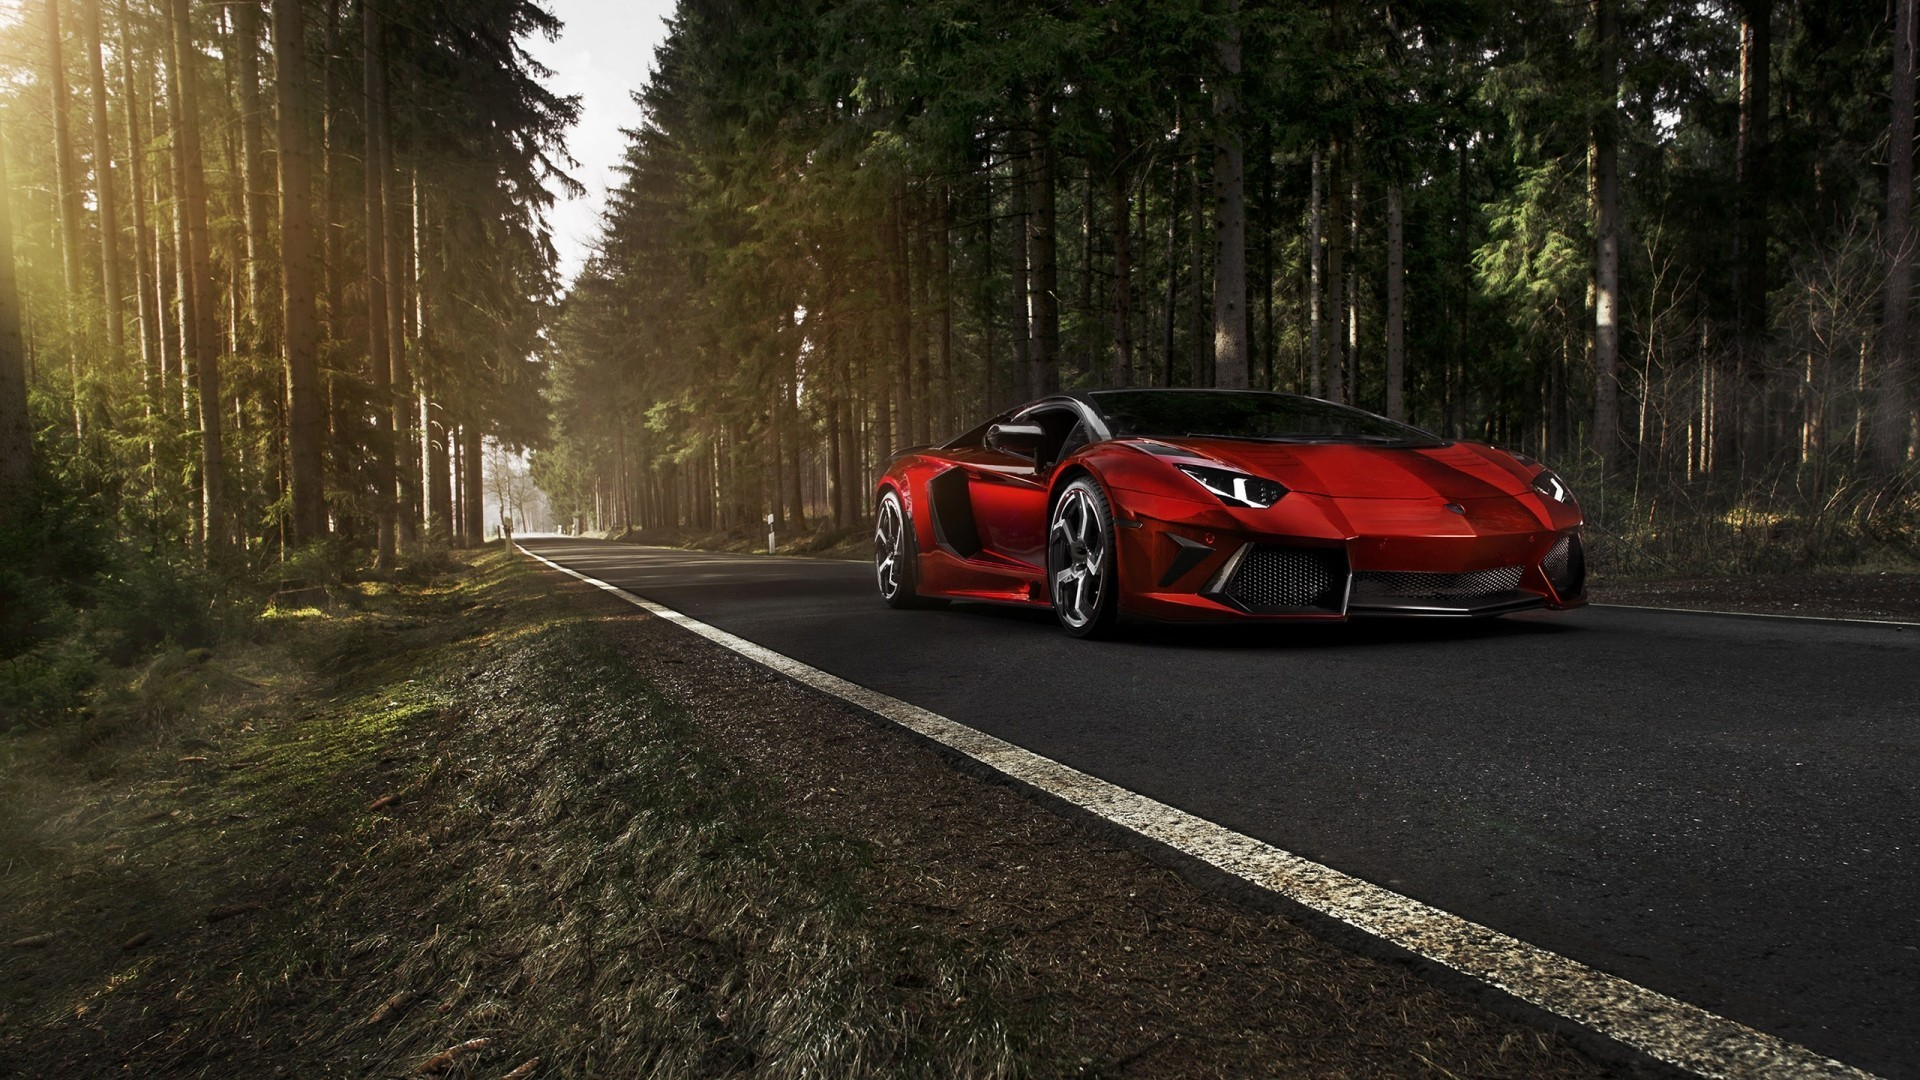 Яркий снимок красного Lamborghini Aventador на дороге